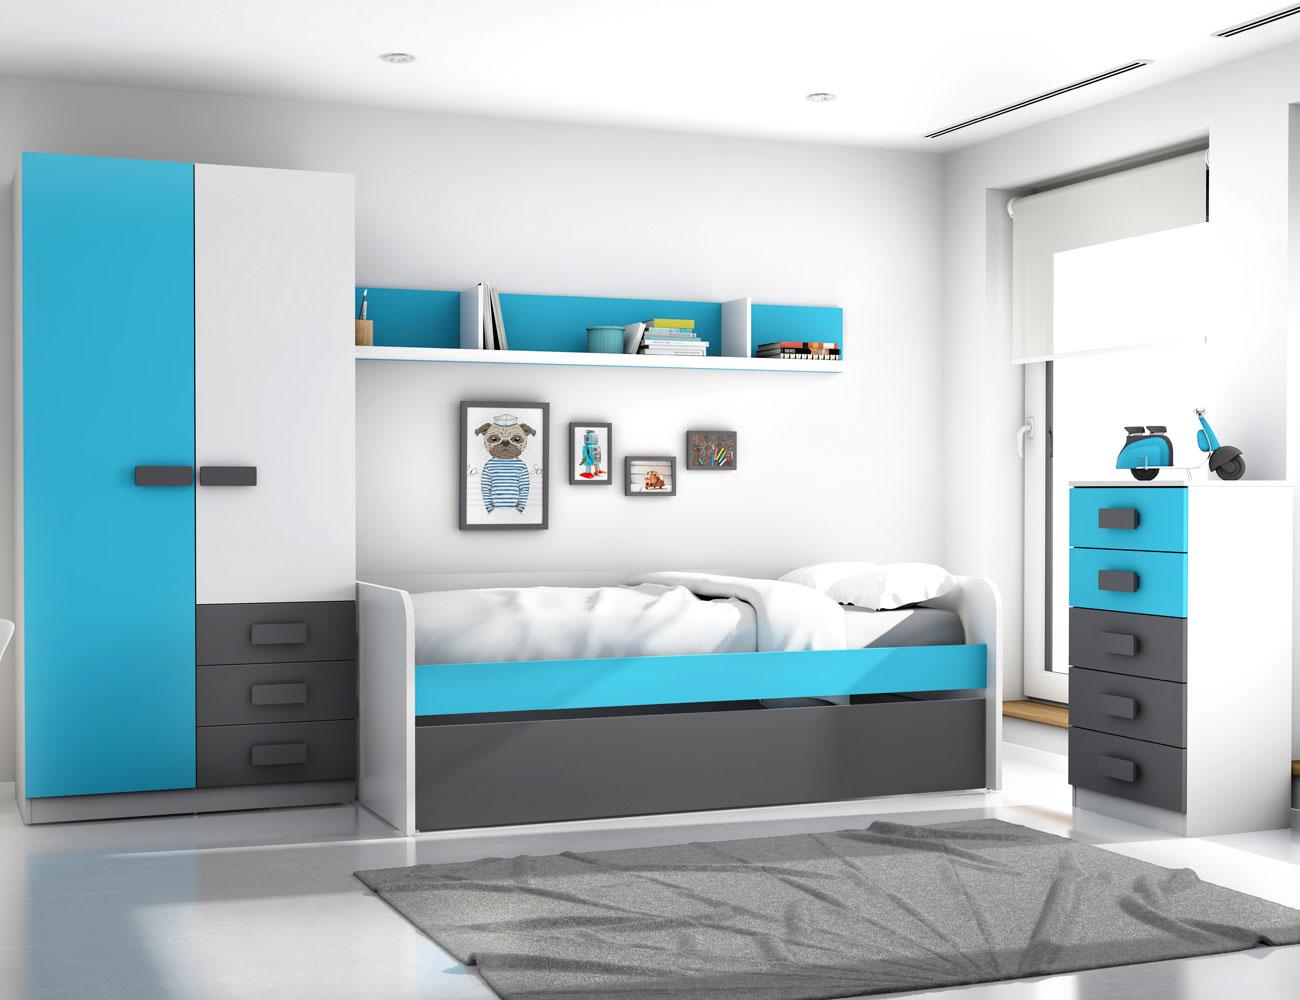 Dormitorio juvenil grafito azul1